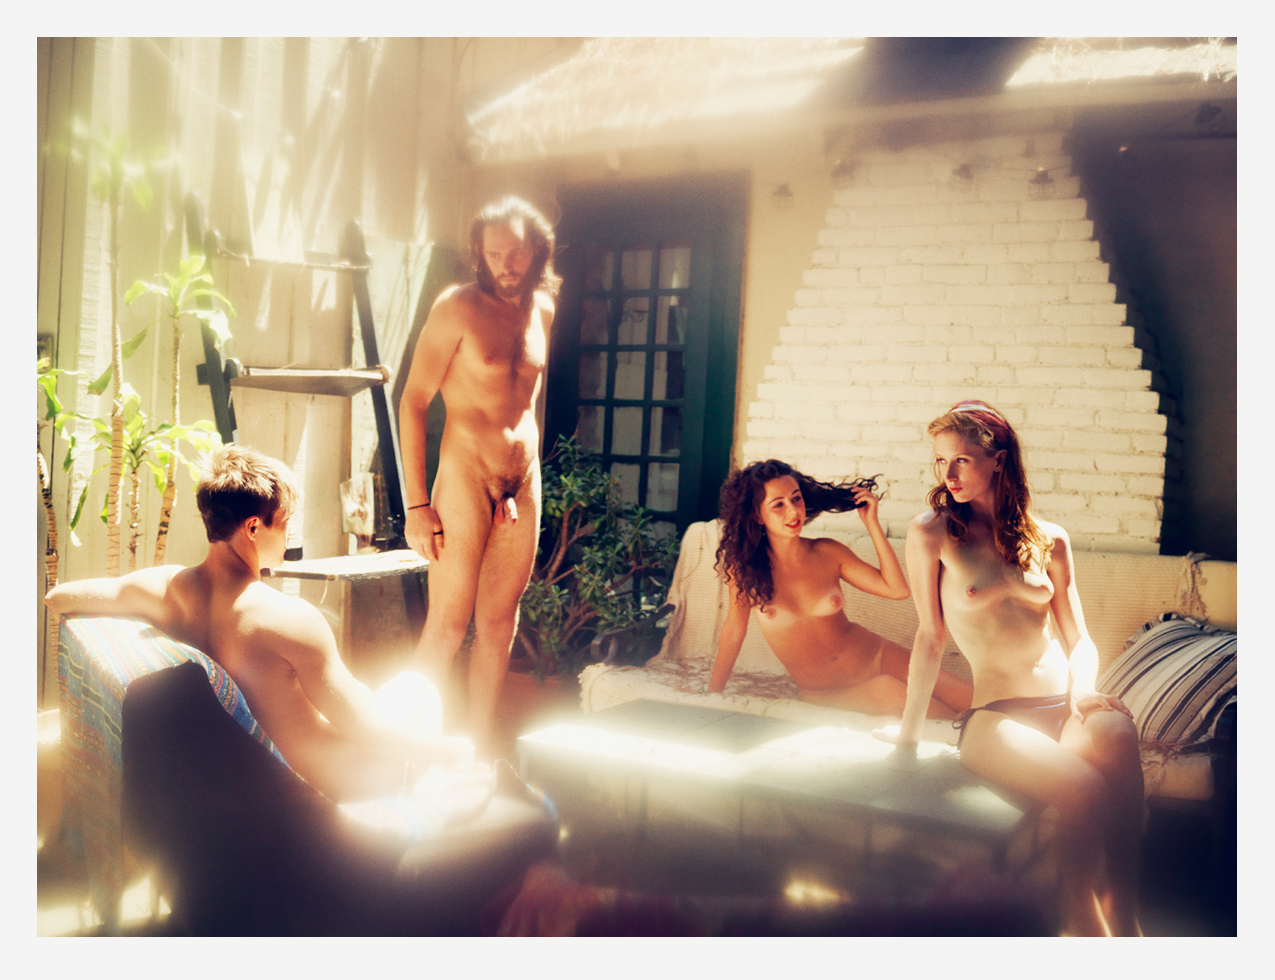 Alex chance naked